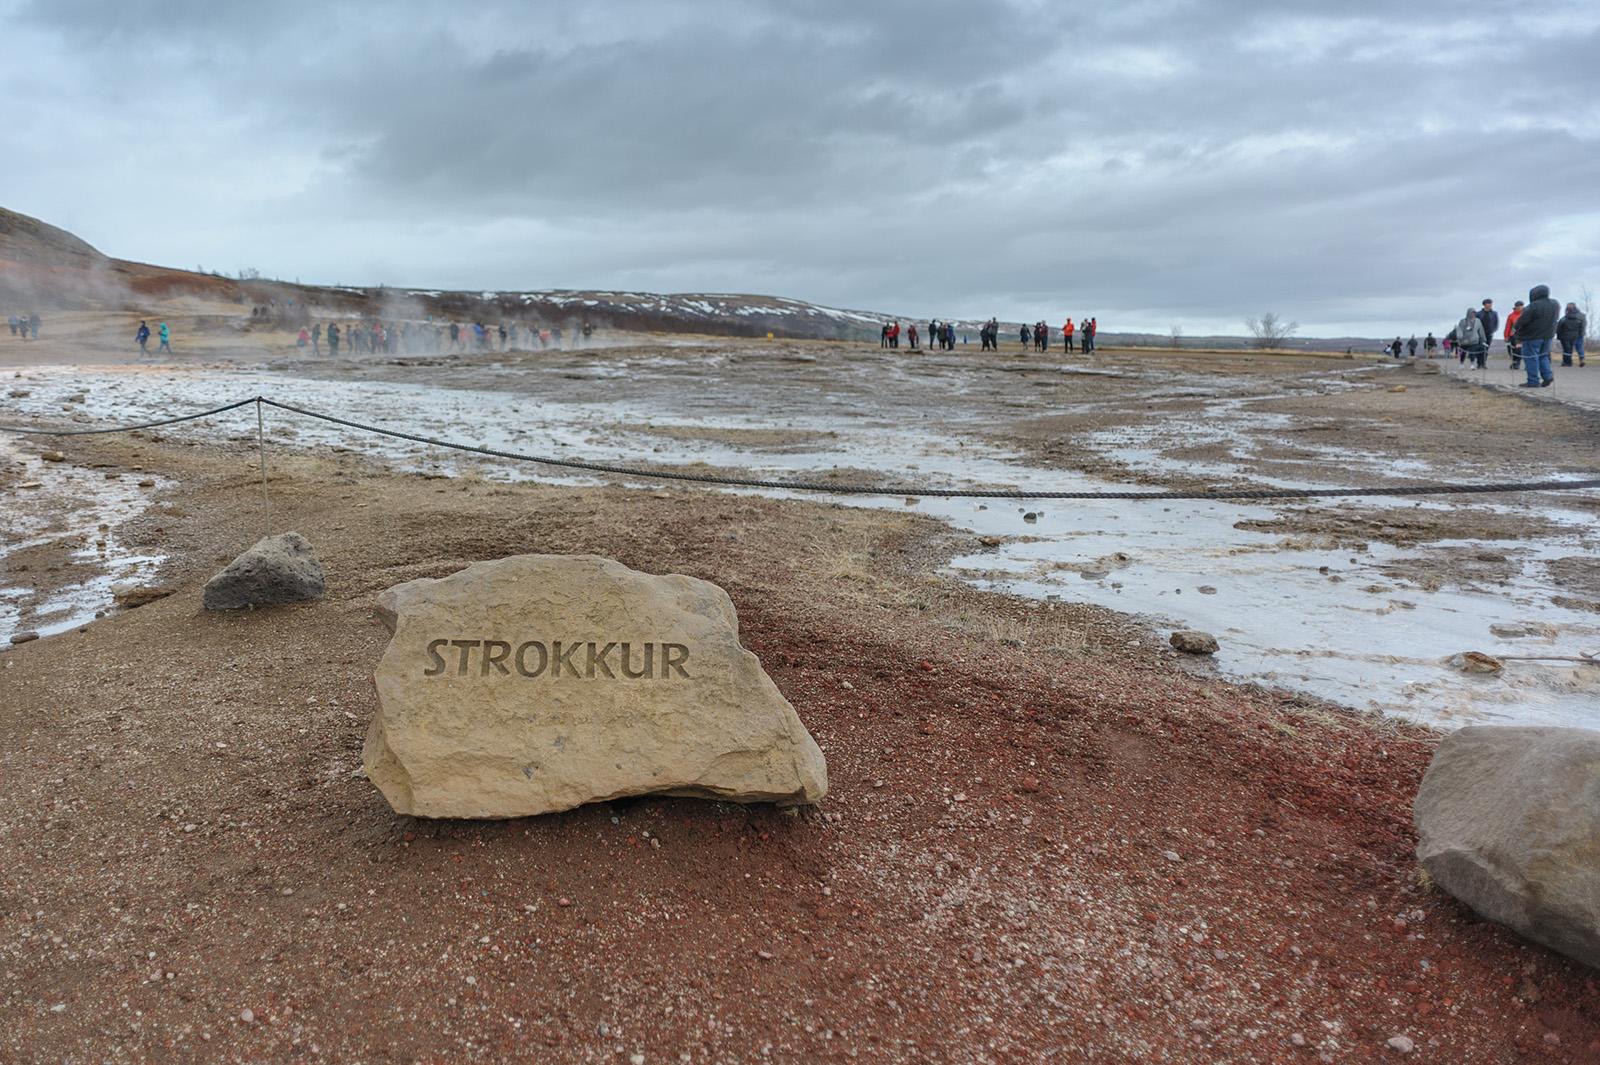 гейзер Strokkur, Haukadalur.